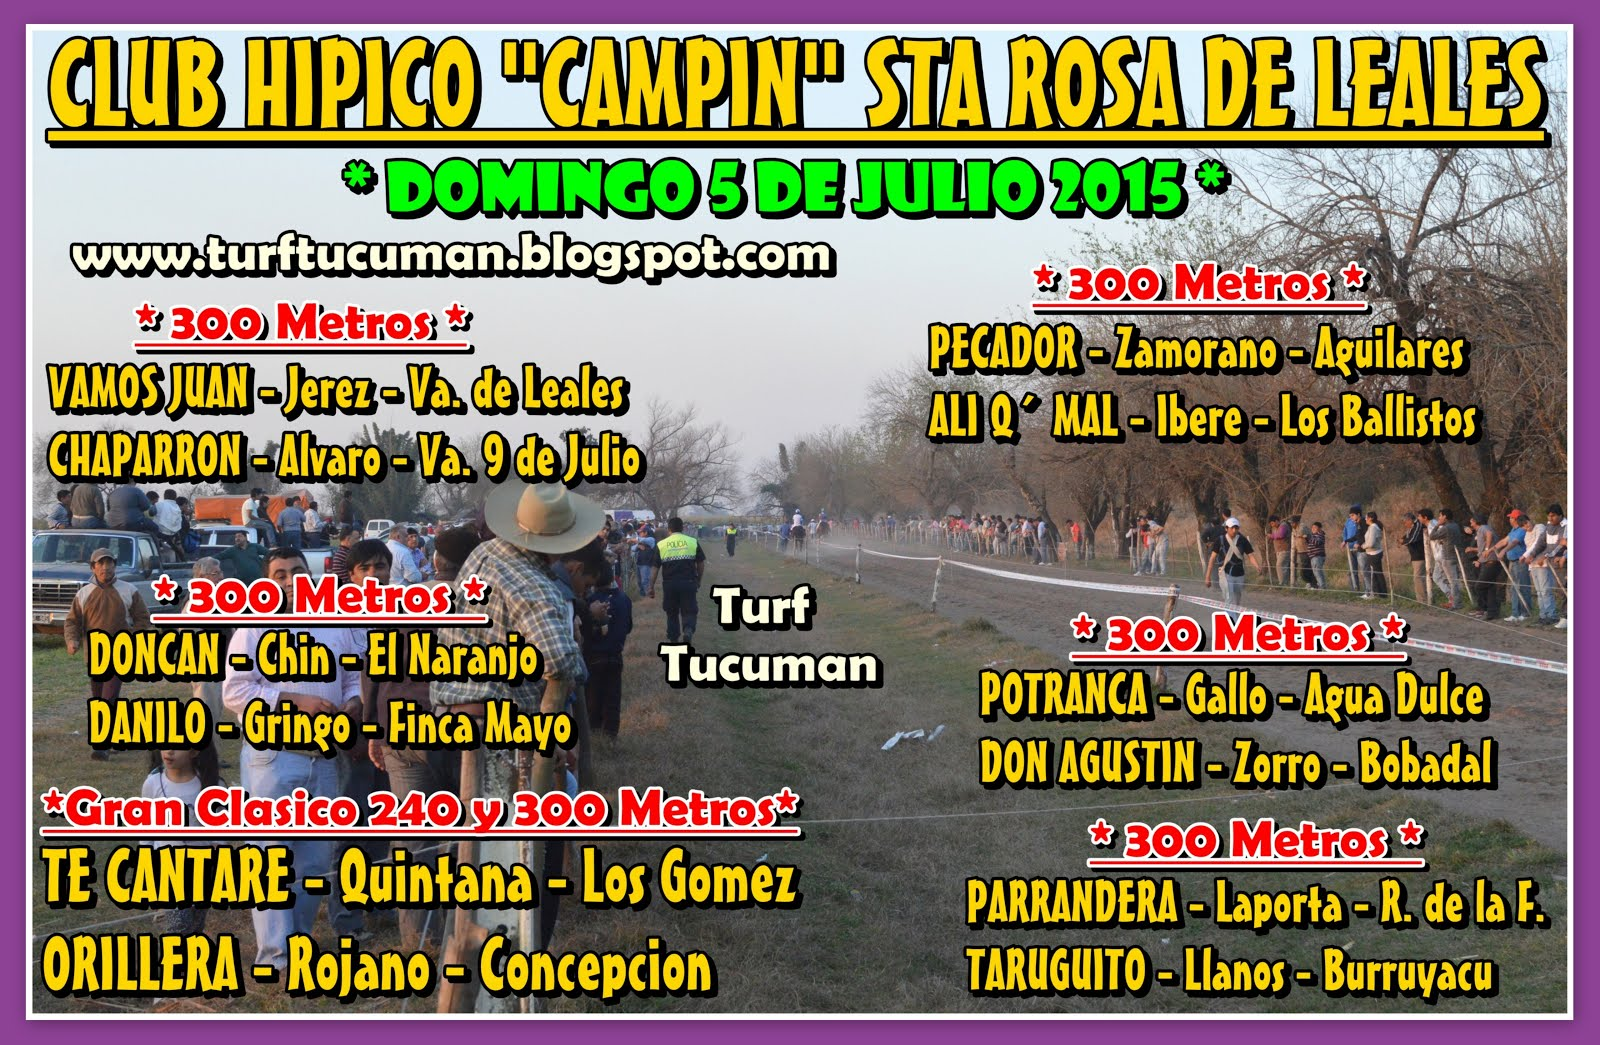 PROG CAMPIN DGO 5